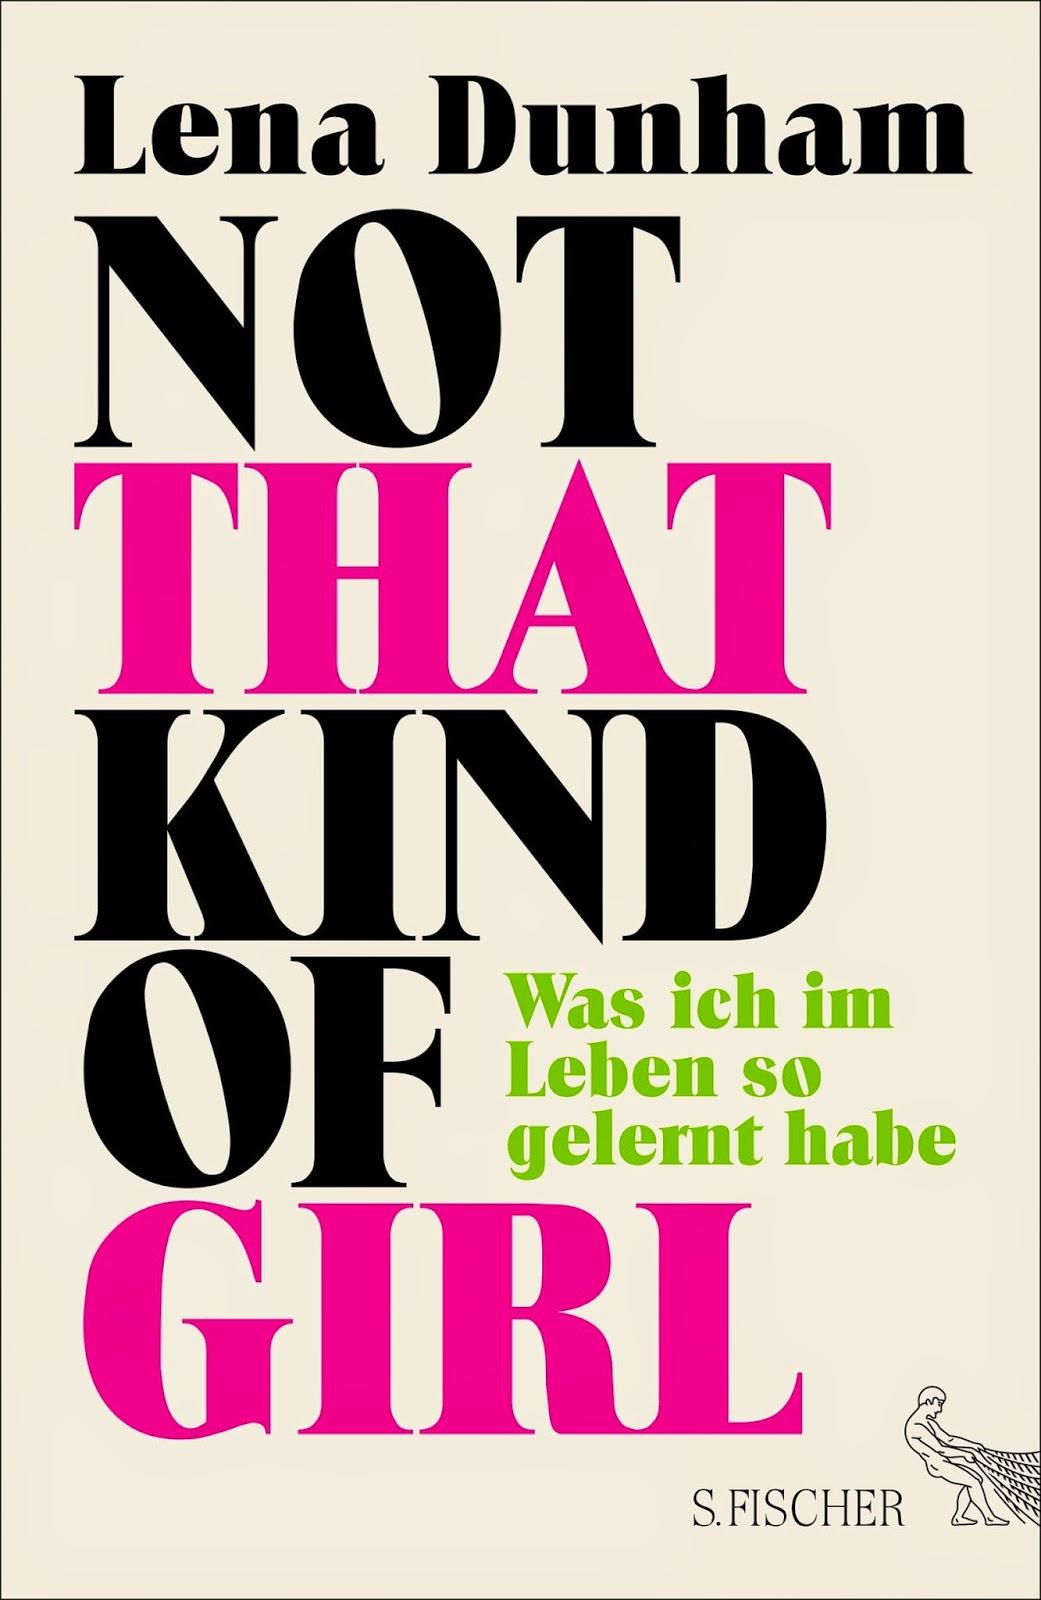 http://www.amazon.de/Not-That-Kind-Girl-gelernt/dp/3100153561/ref=sr_1_2?ie=UTF8&qid=1417715787&sr=8-2&keywords=not+that+kind+of+girl